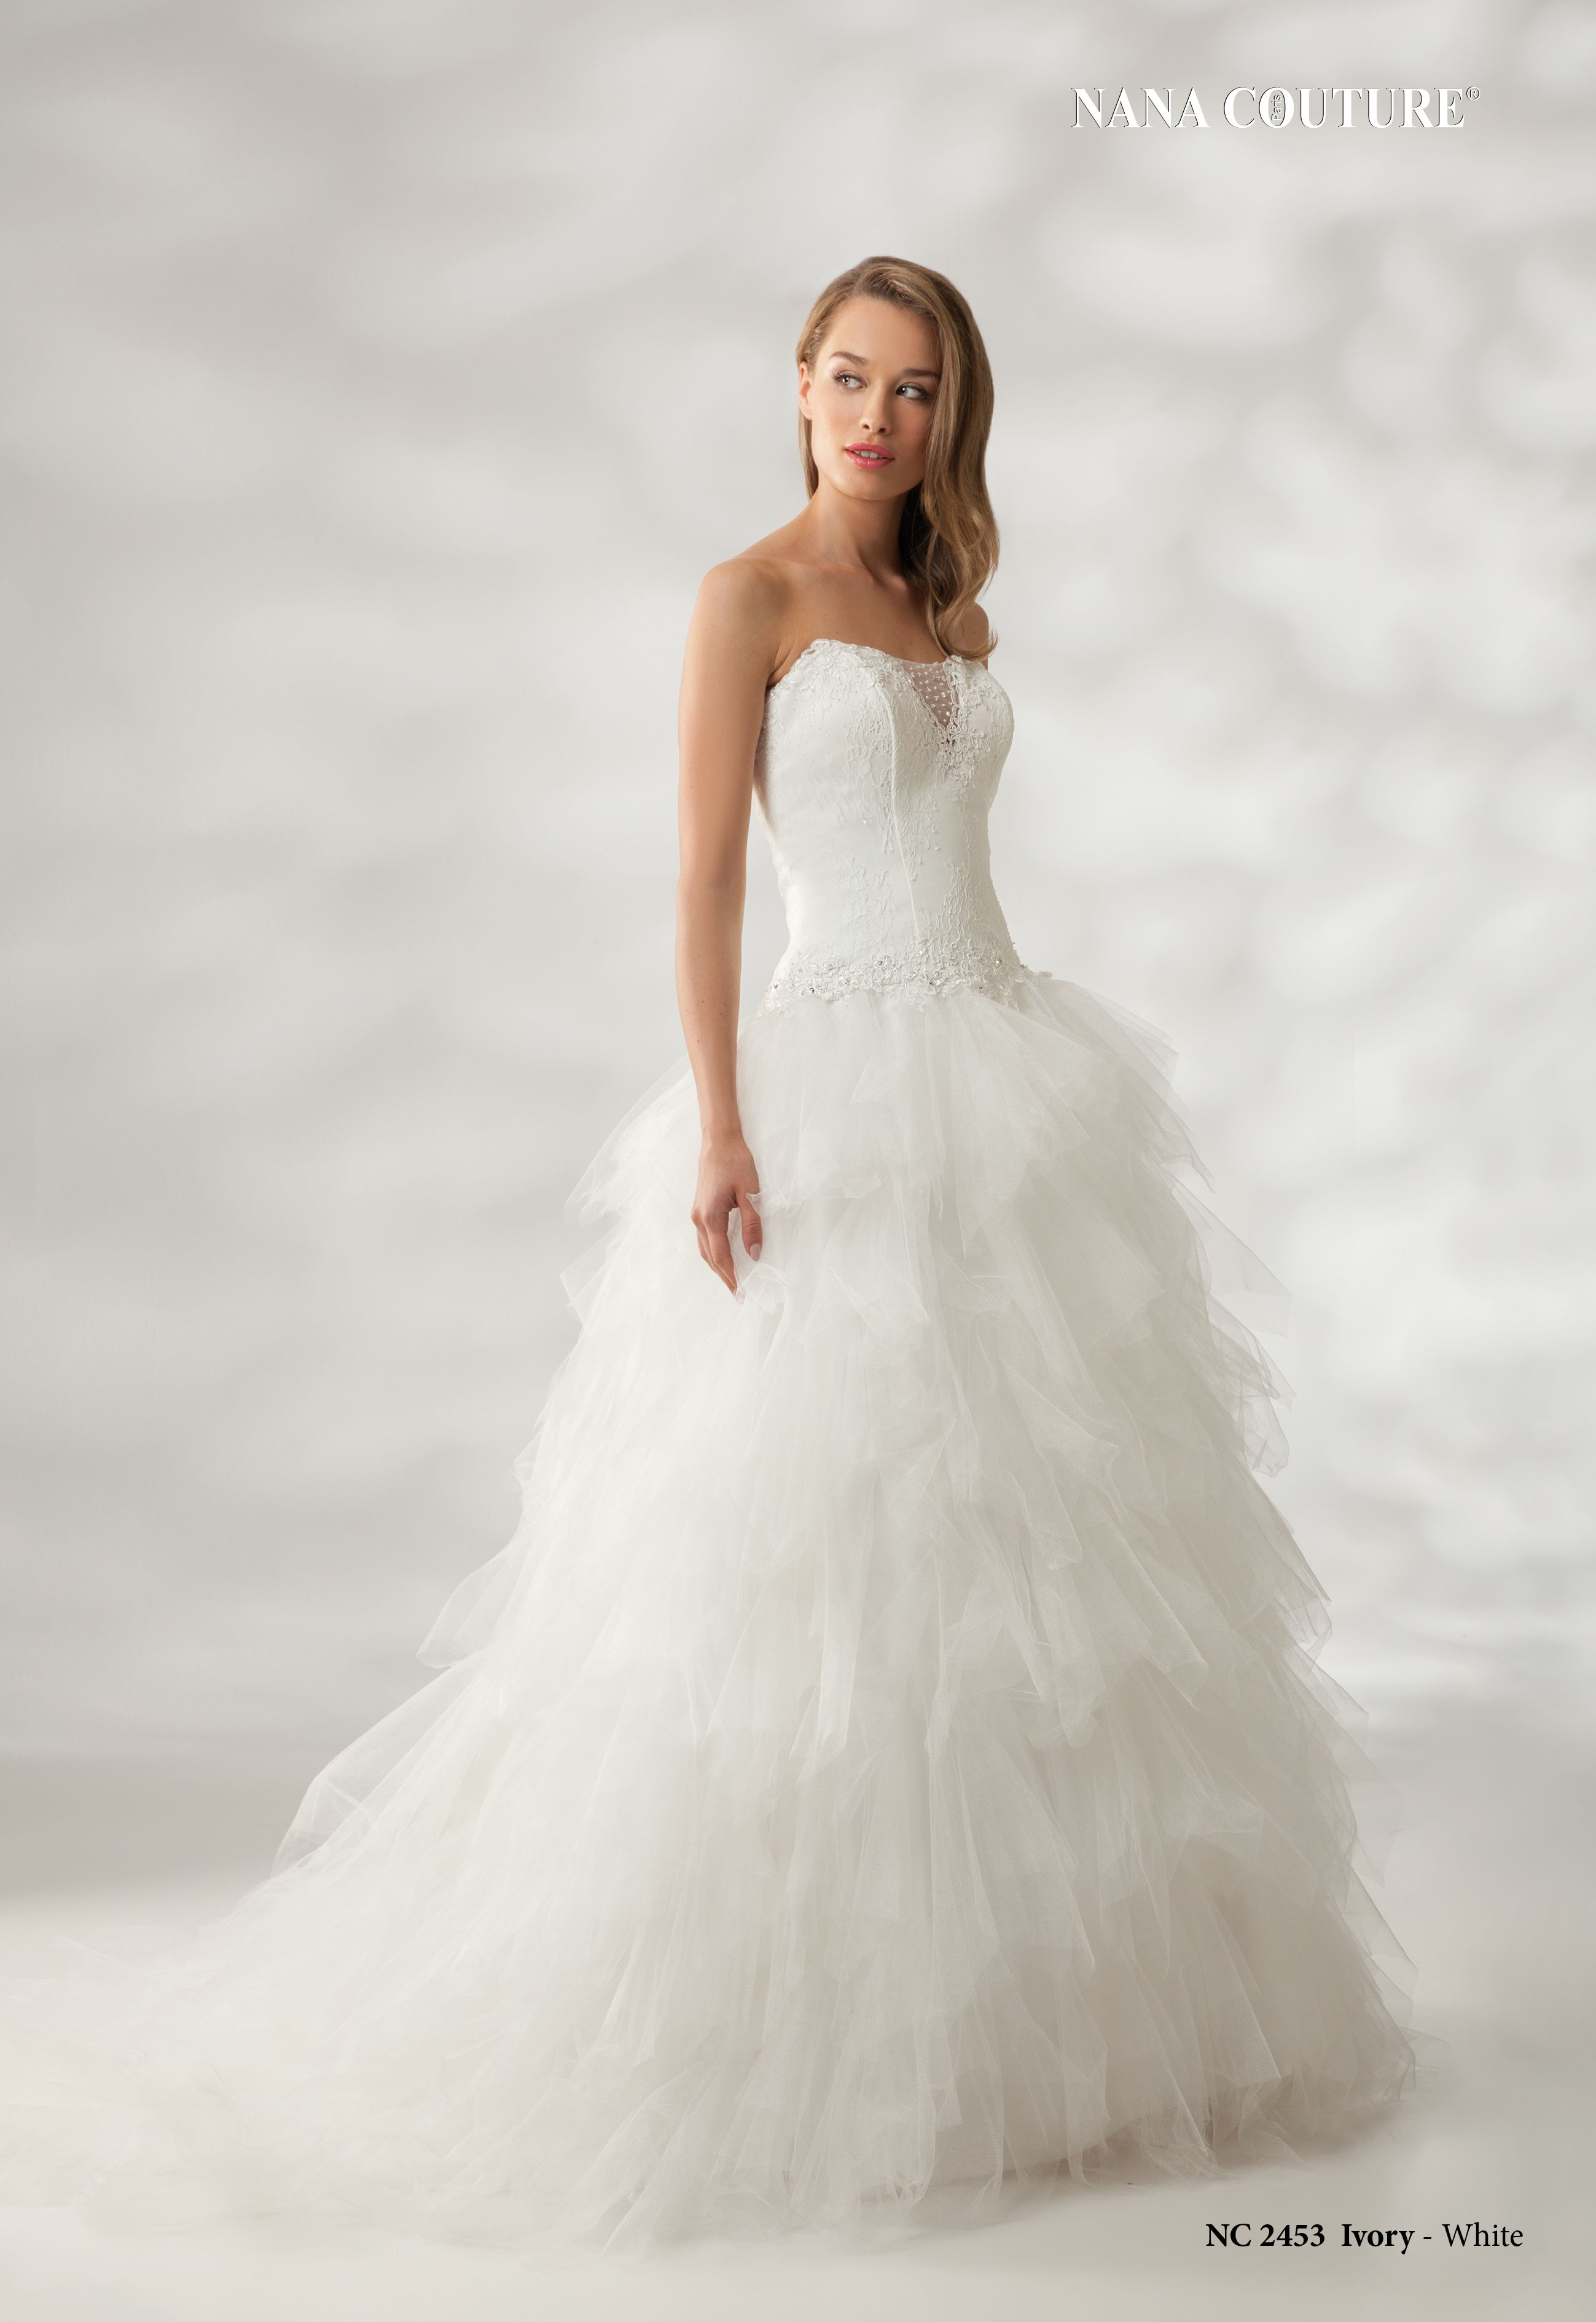 Robe de Mariée france #weddingdress #mariage2